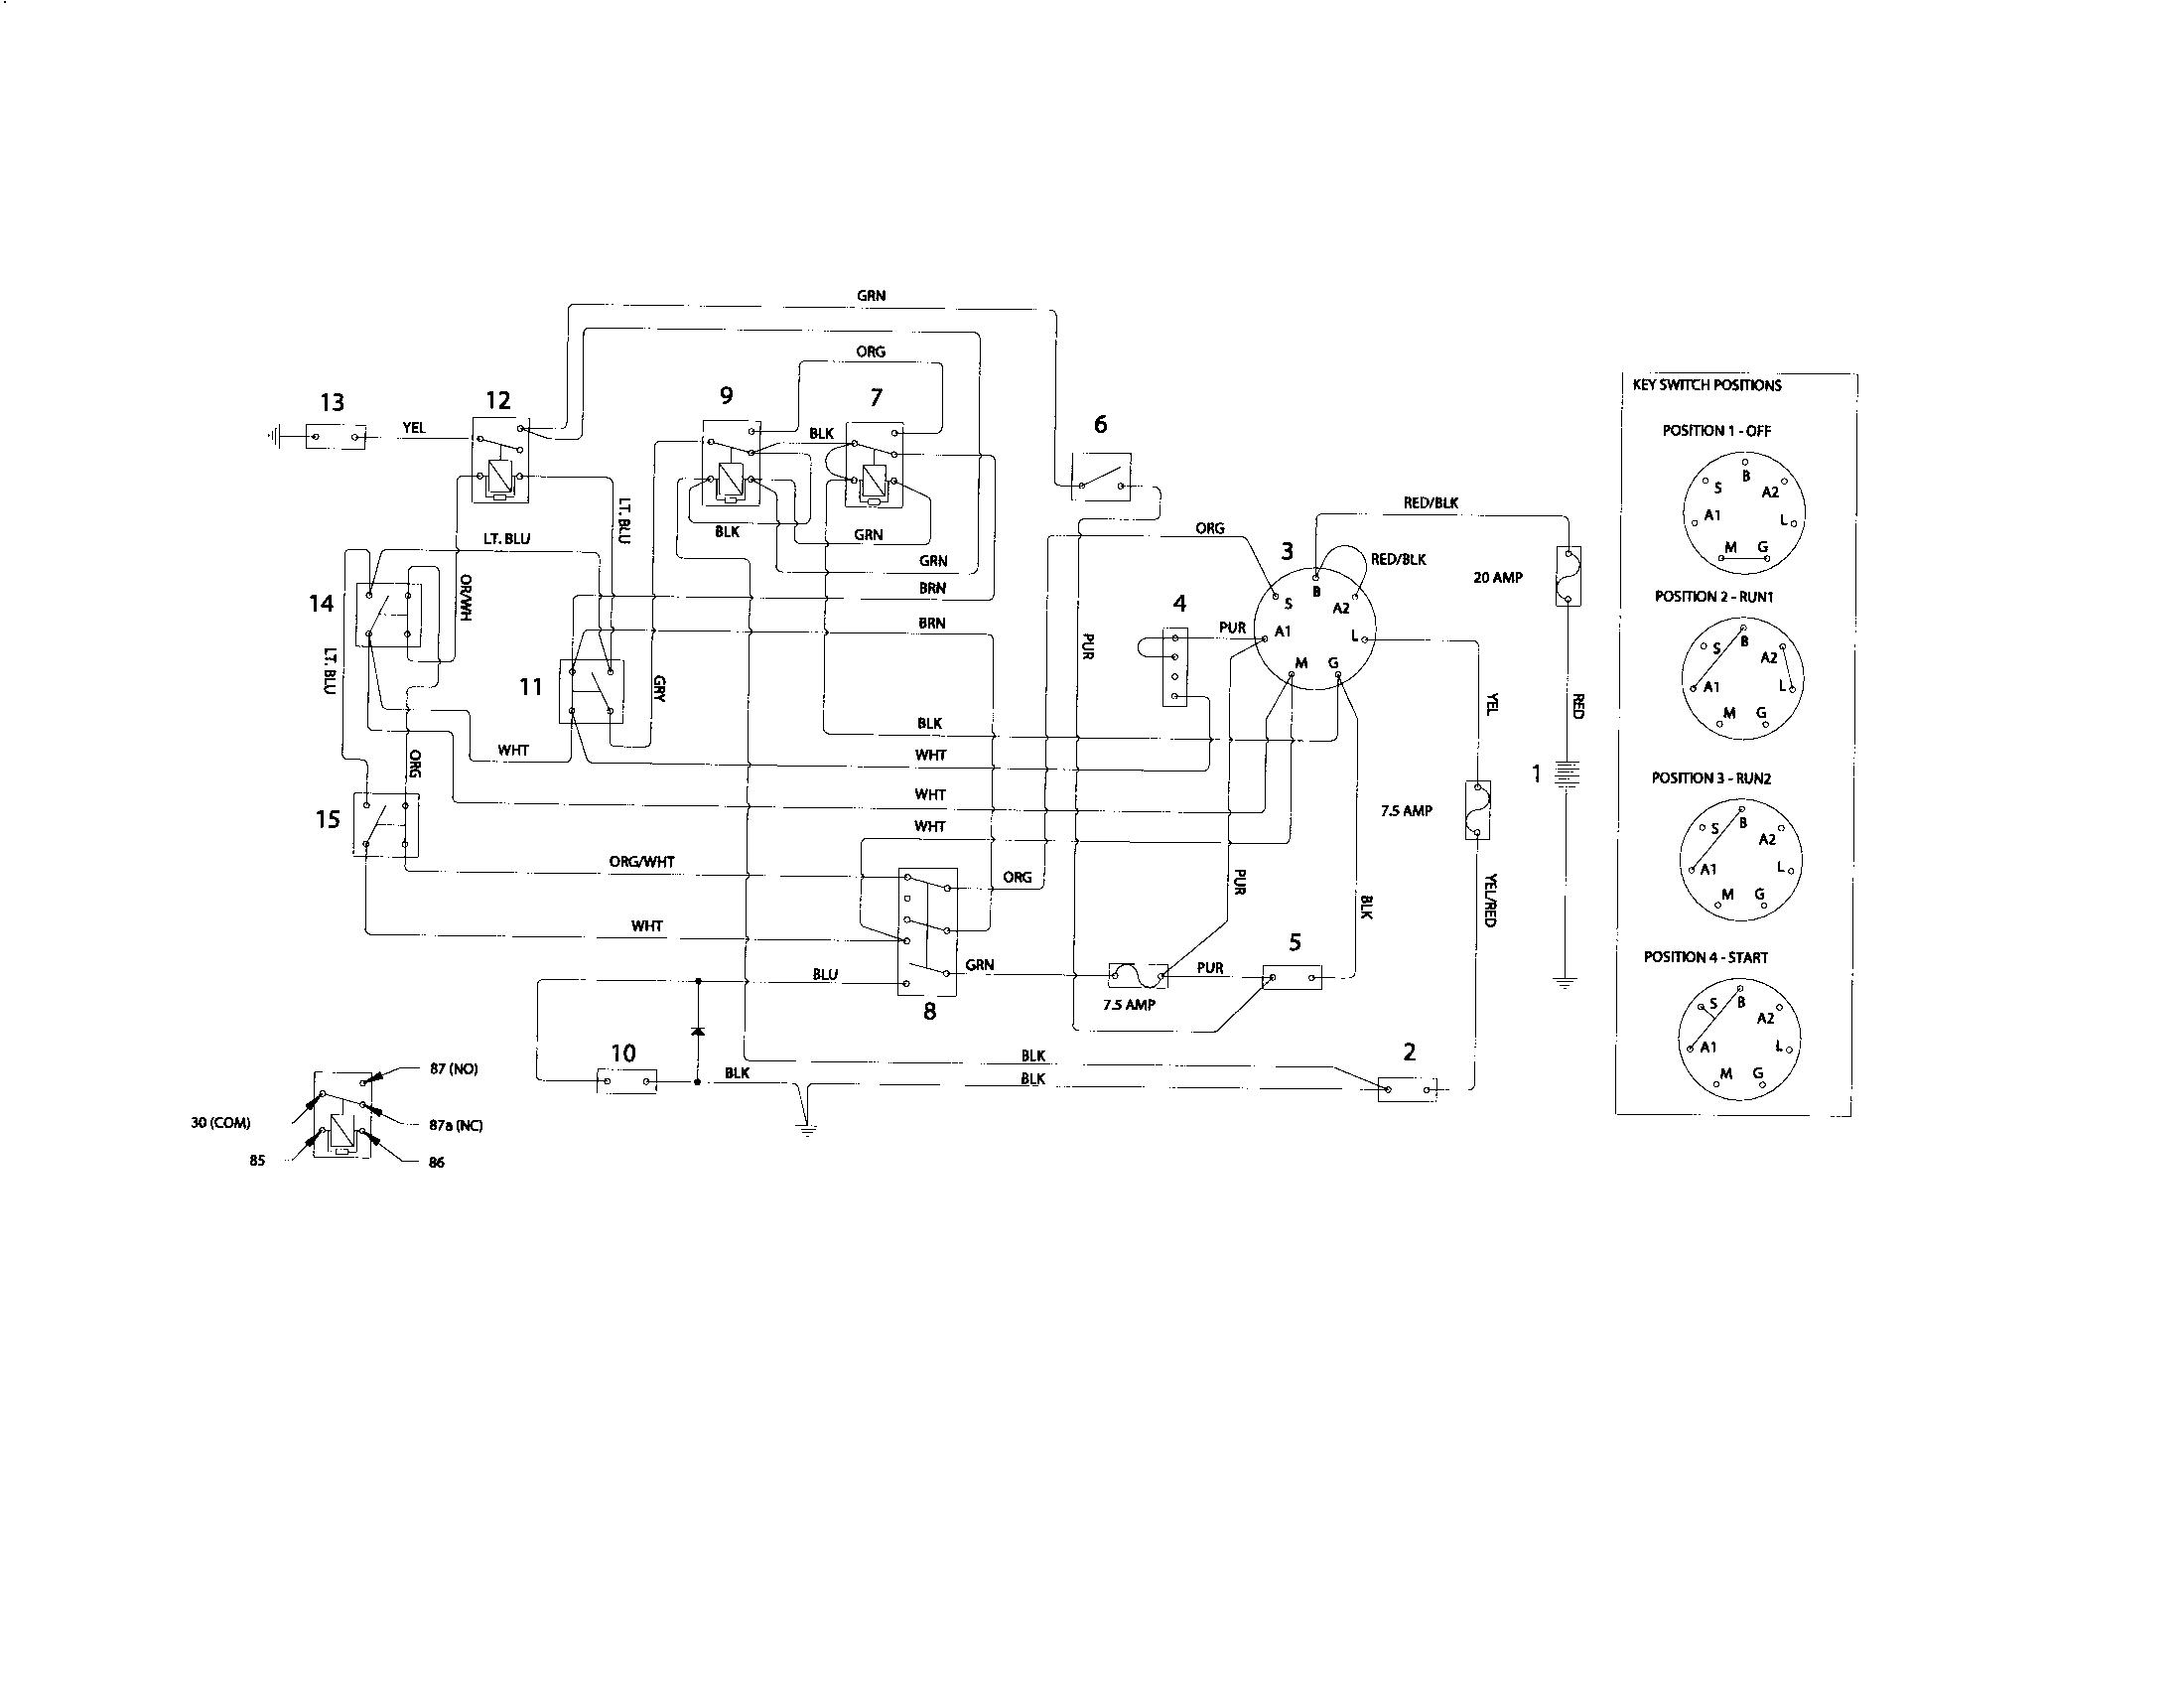 Wiring Diagram For Husqvarna Riding Mower